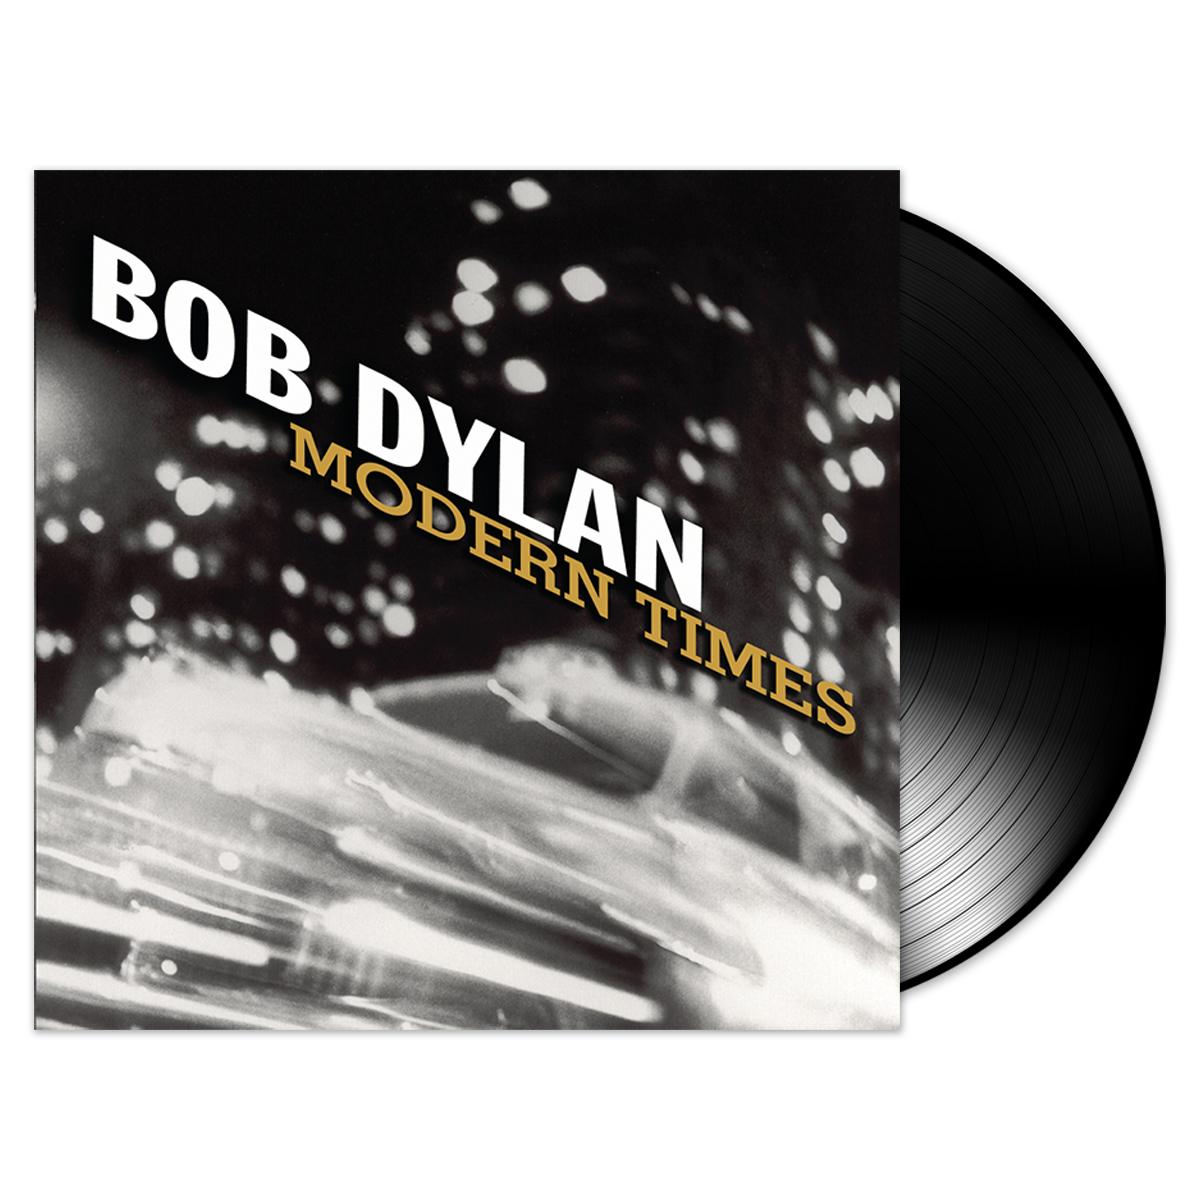 Modern Times 2-LP Vinyl